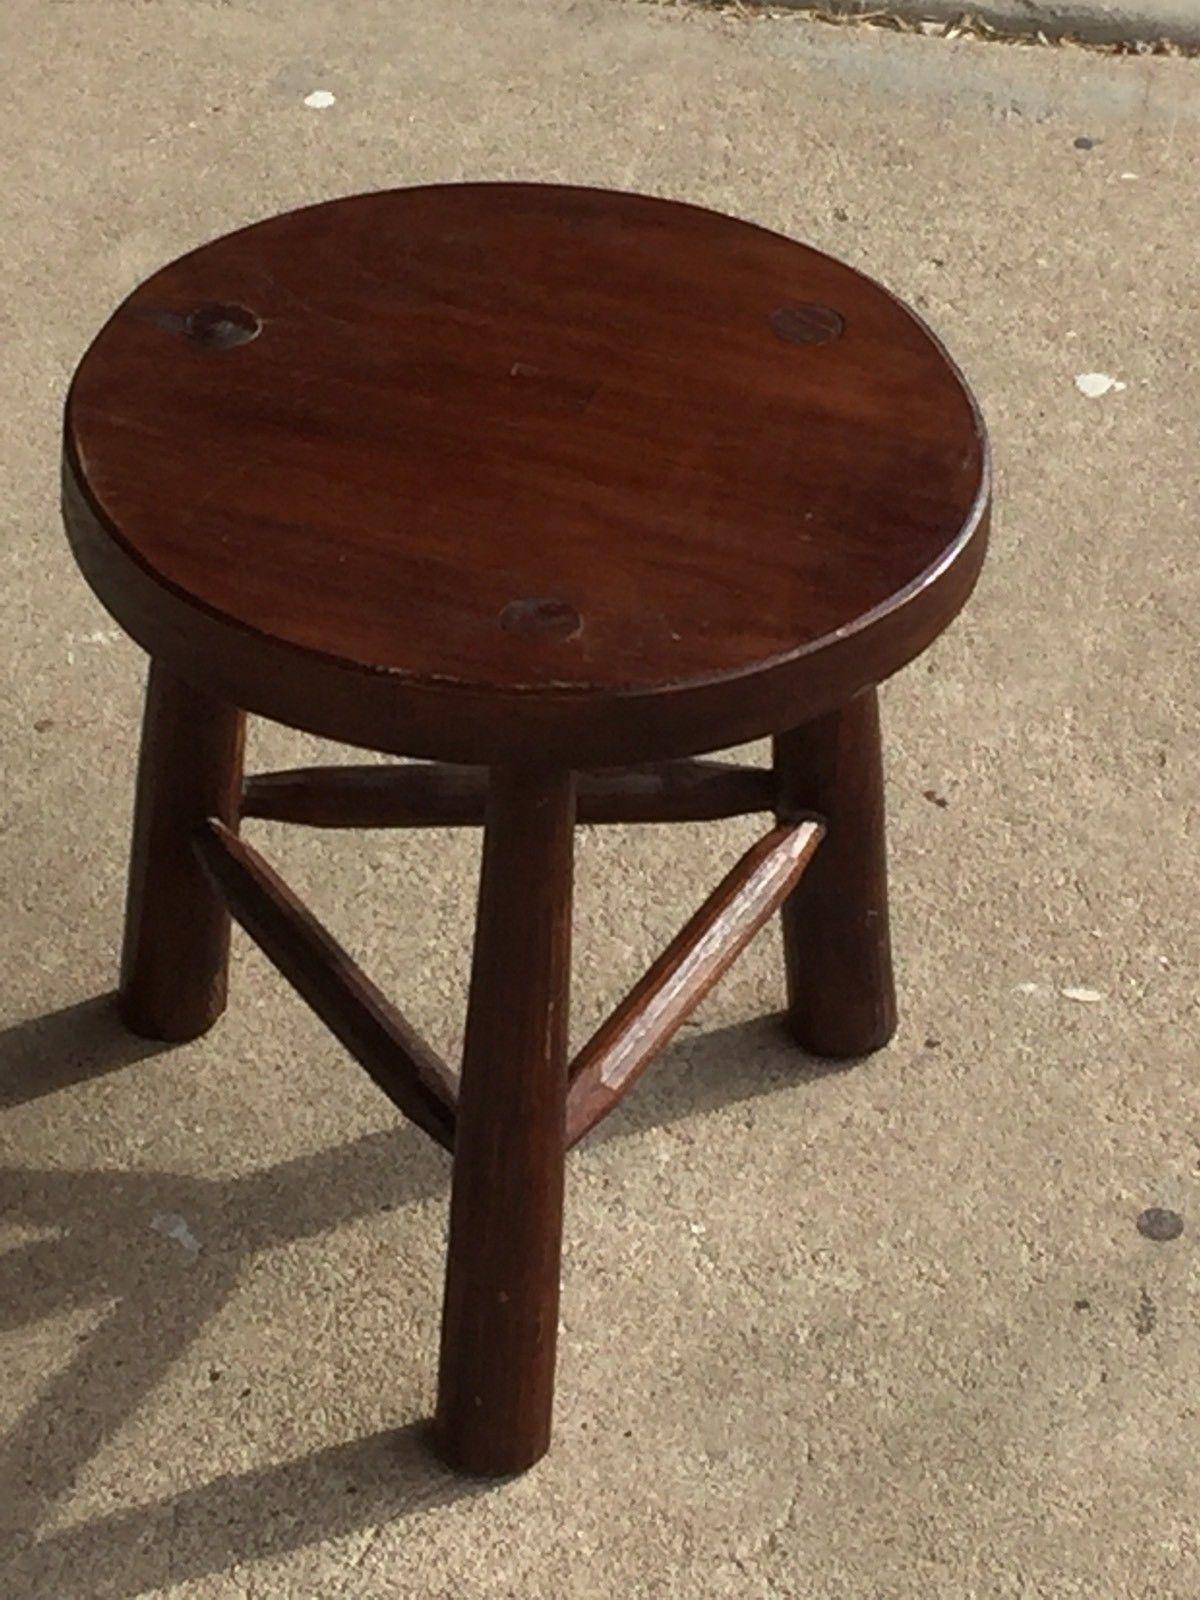 DAVID SMITH U0026 Co. Milking Stool ( Handcrafted Furniture / Old World Java